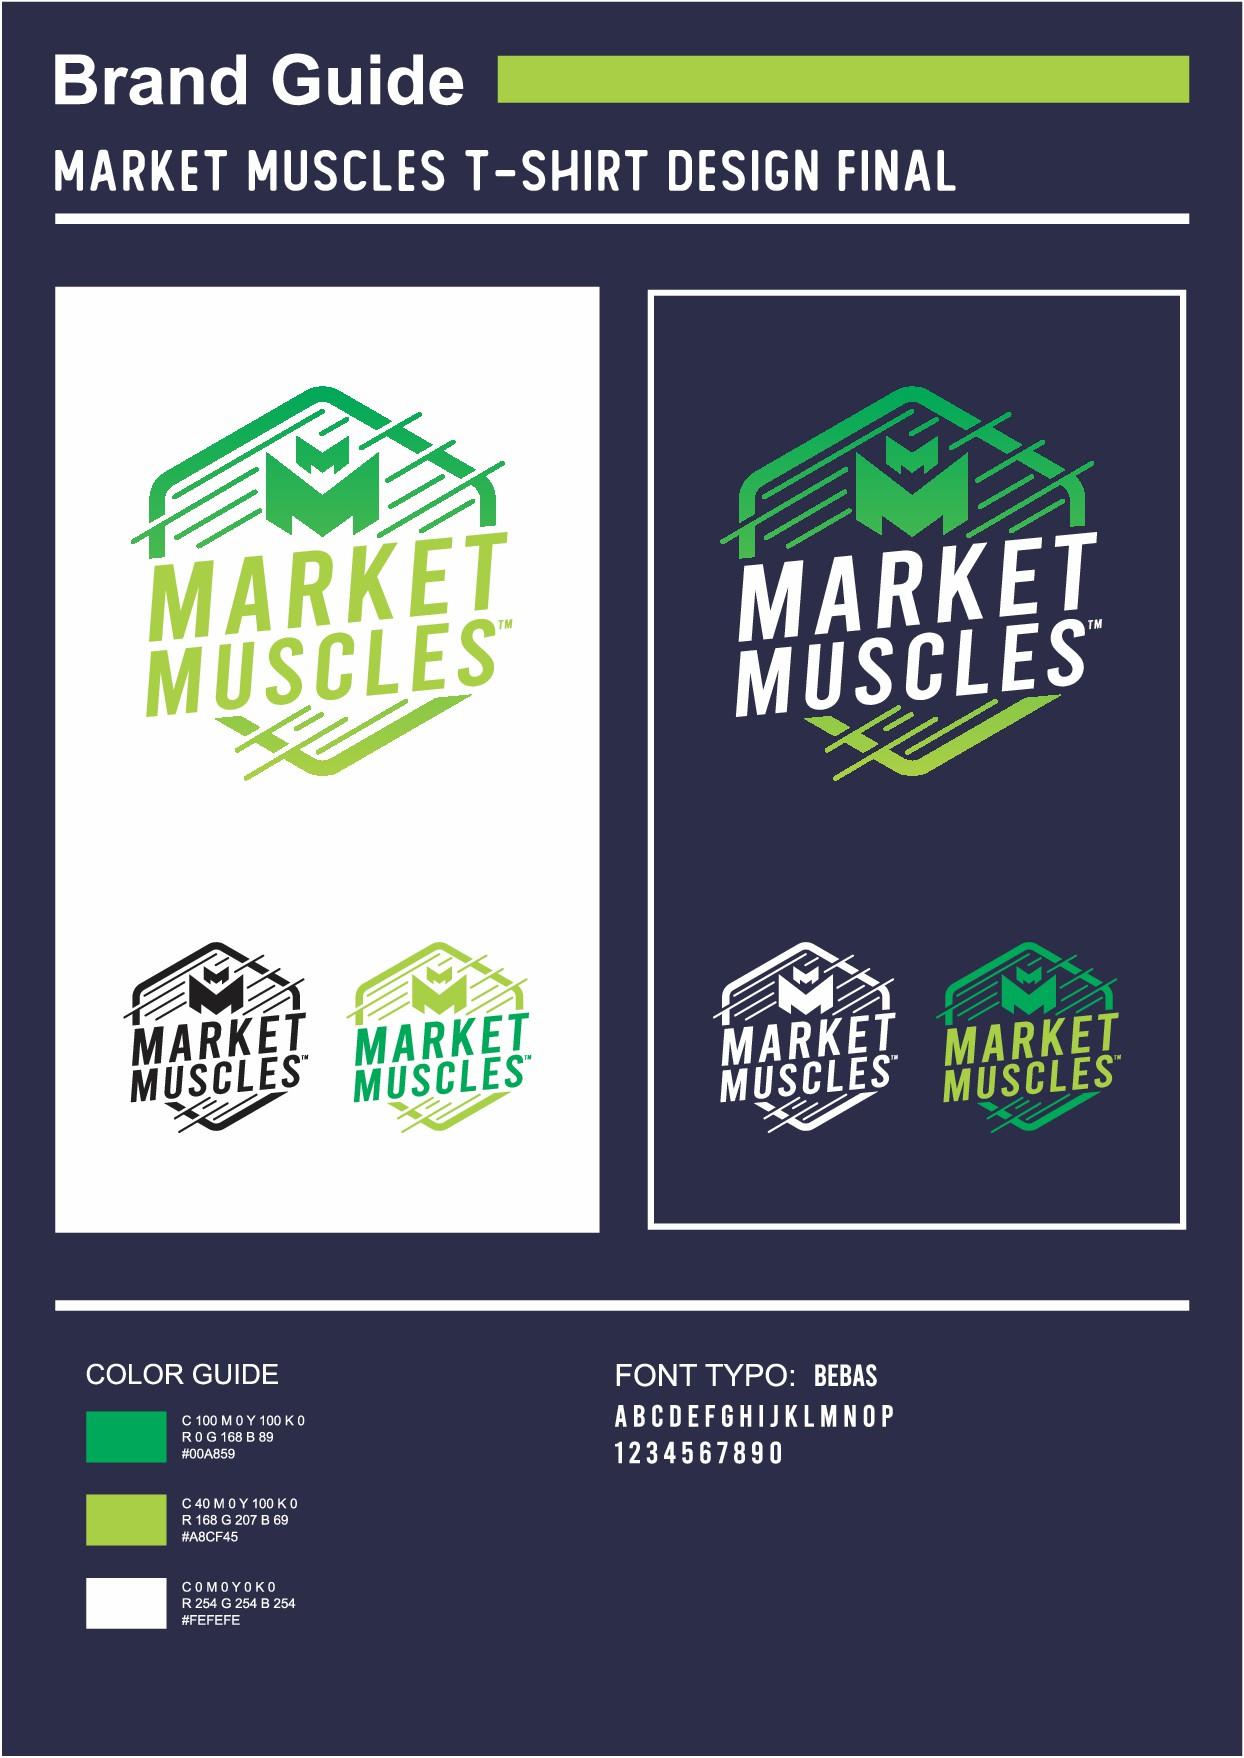 Guaranteed Winner - Trendy T Shirt Design for Market Muscles